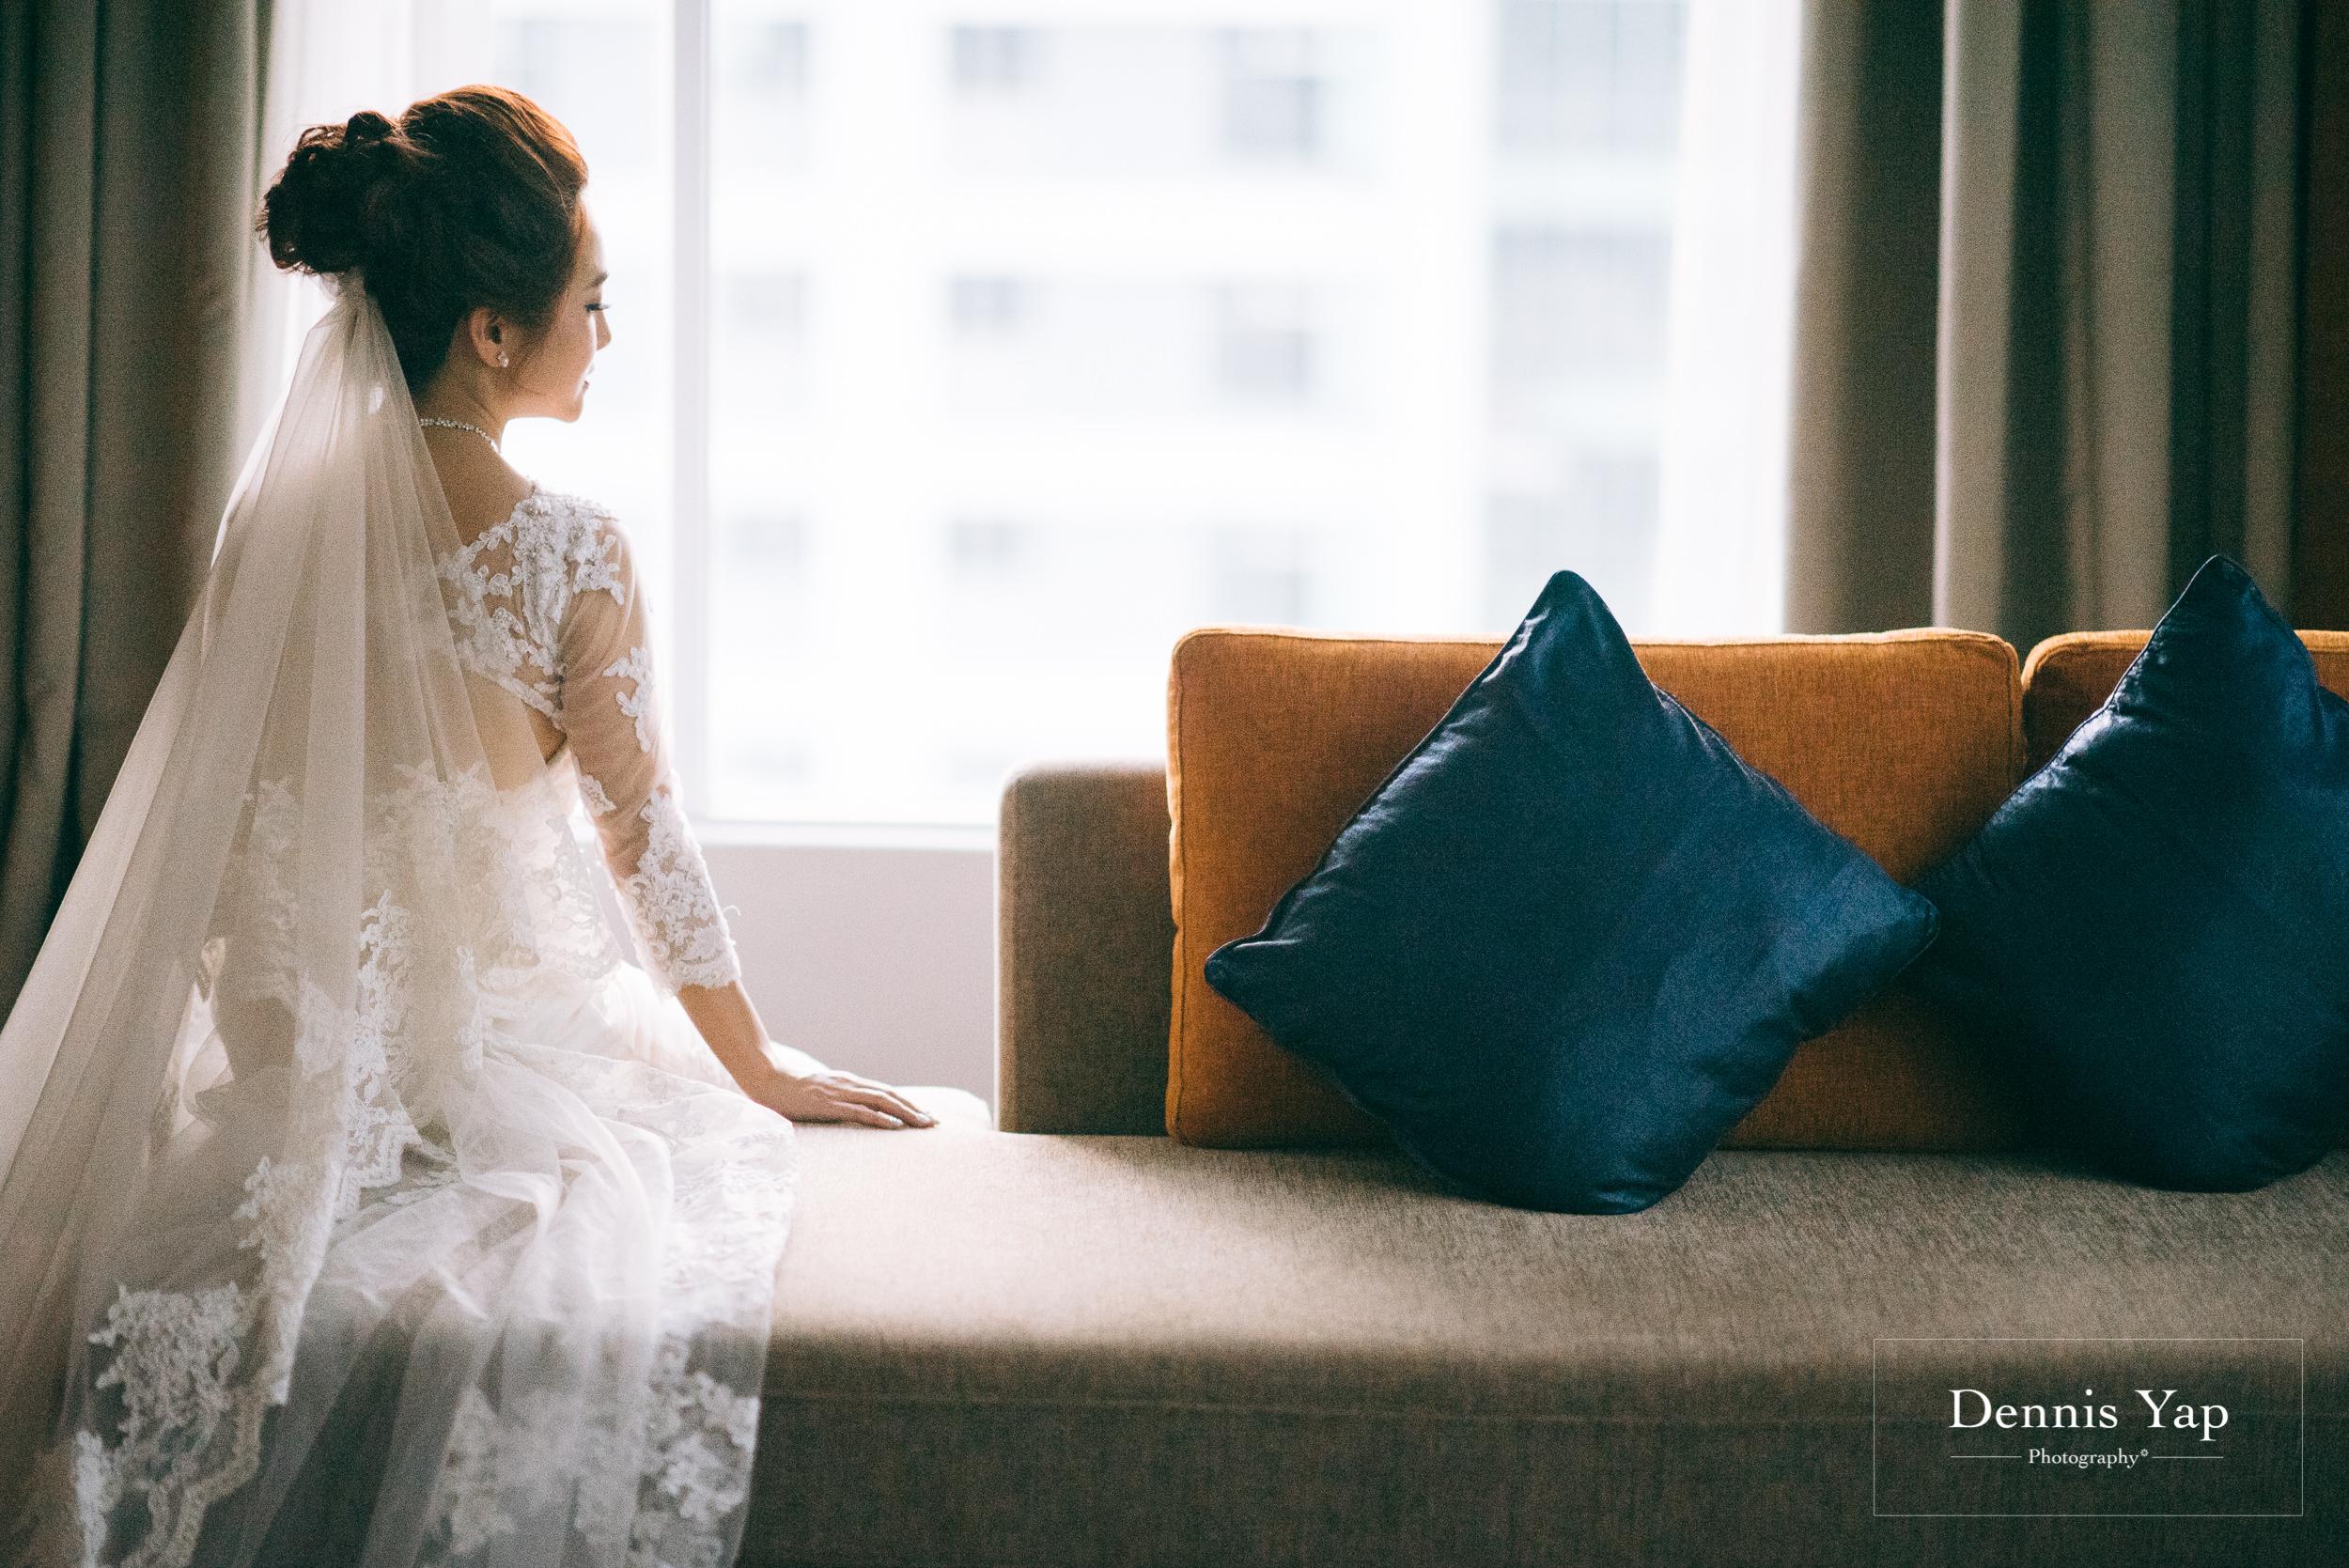 soon seng cherry zenith hotel kuantan dennis yap photography-4.jpg